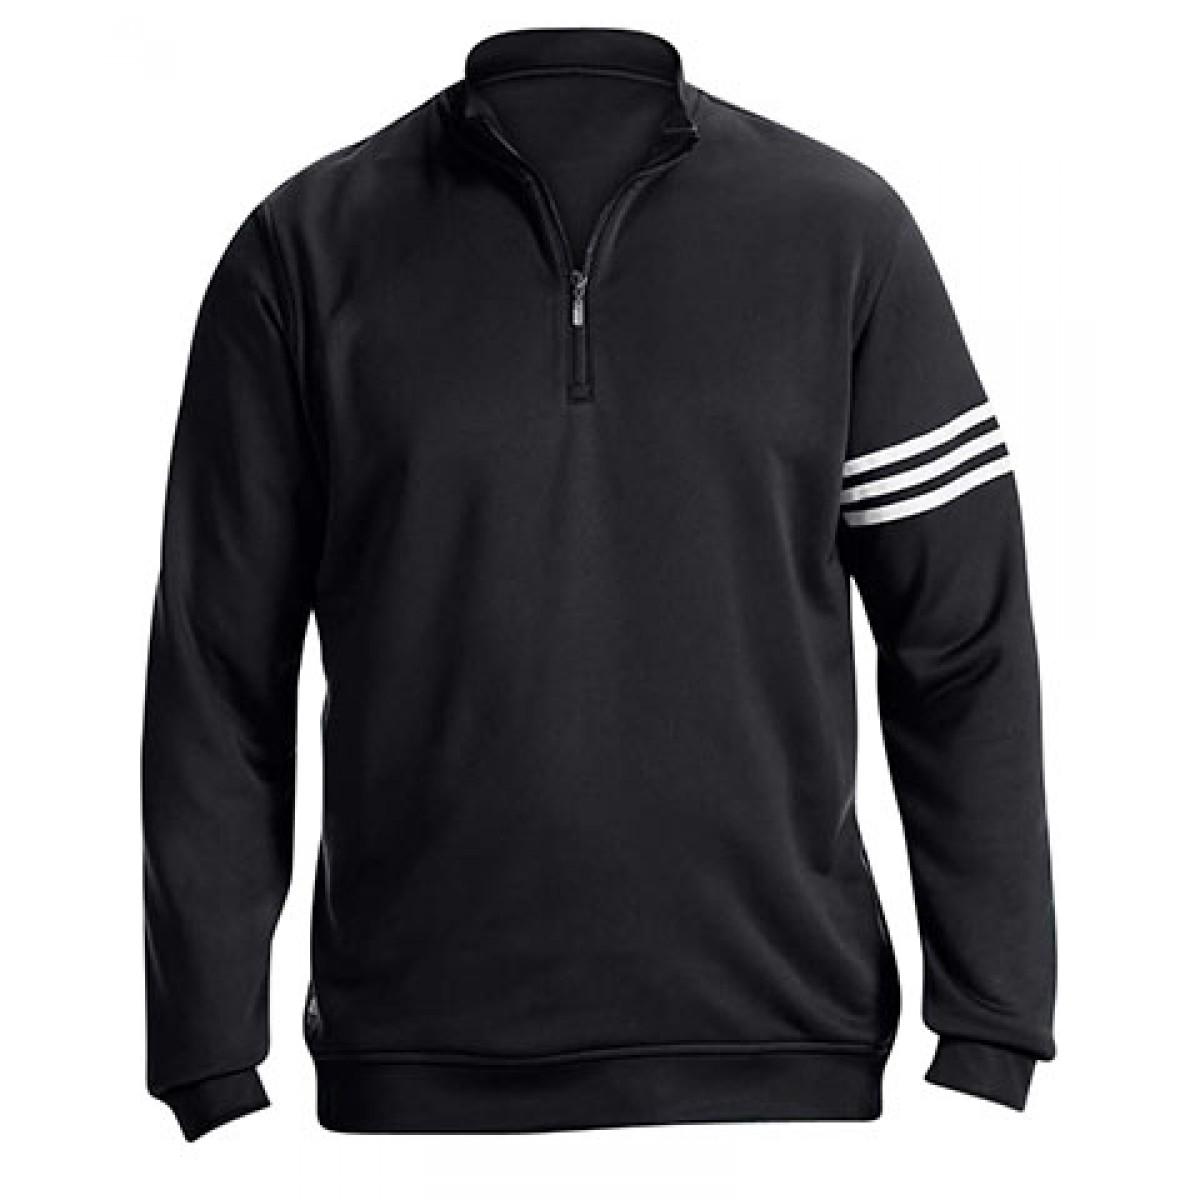 Adidas Golf Men's ClimaLite® 3-Stripes Pullover-Black-M